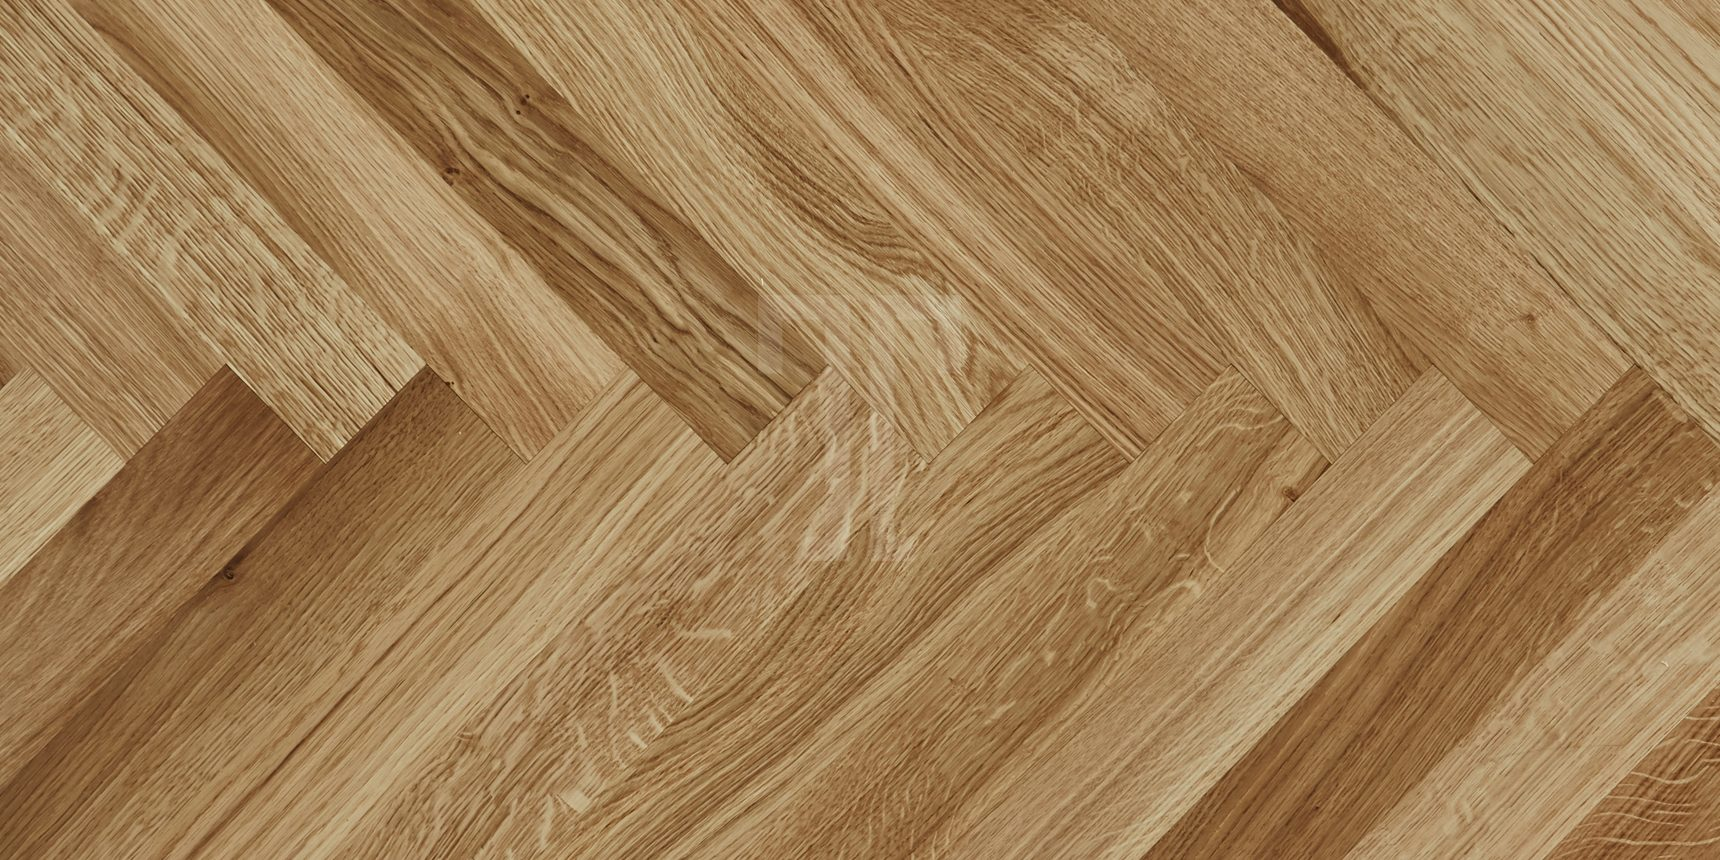 wood floor belvoir pale herringbone parquet wood flooring blocks, patterns and panels  collection UIYHWTS